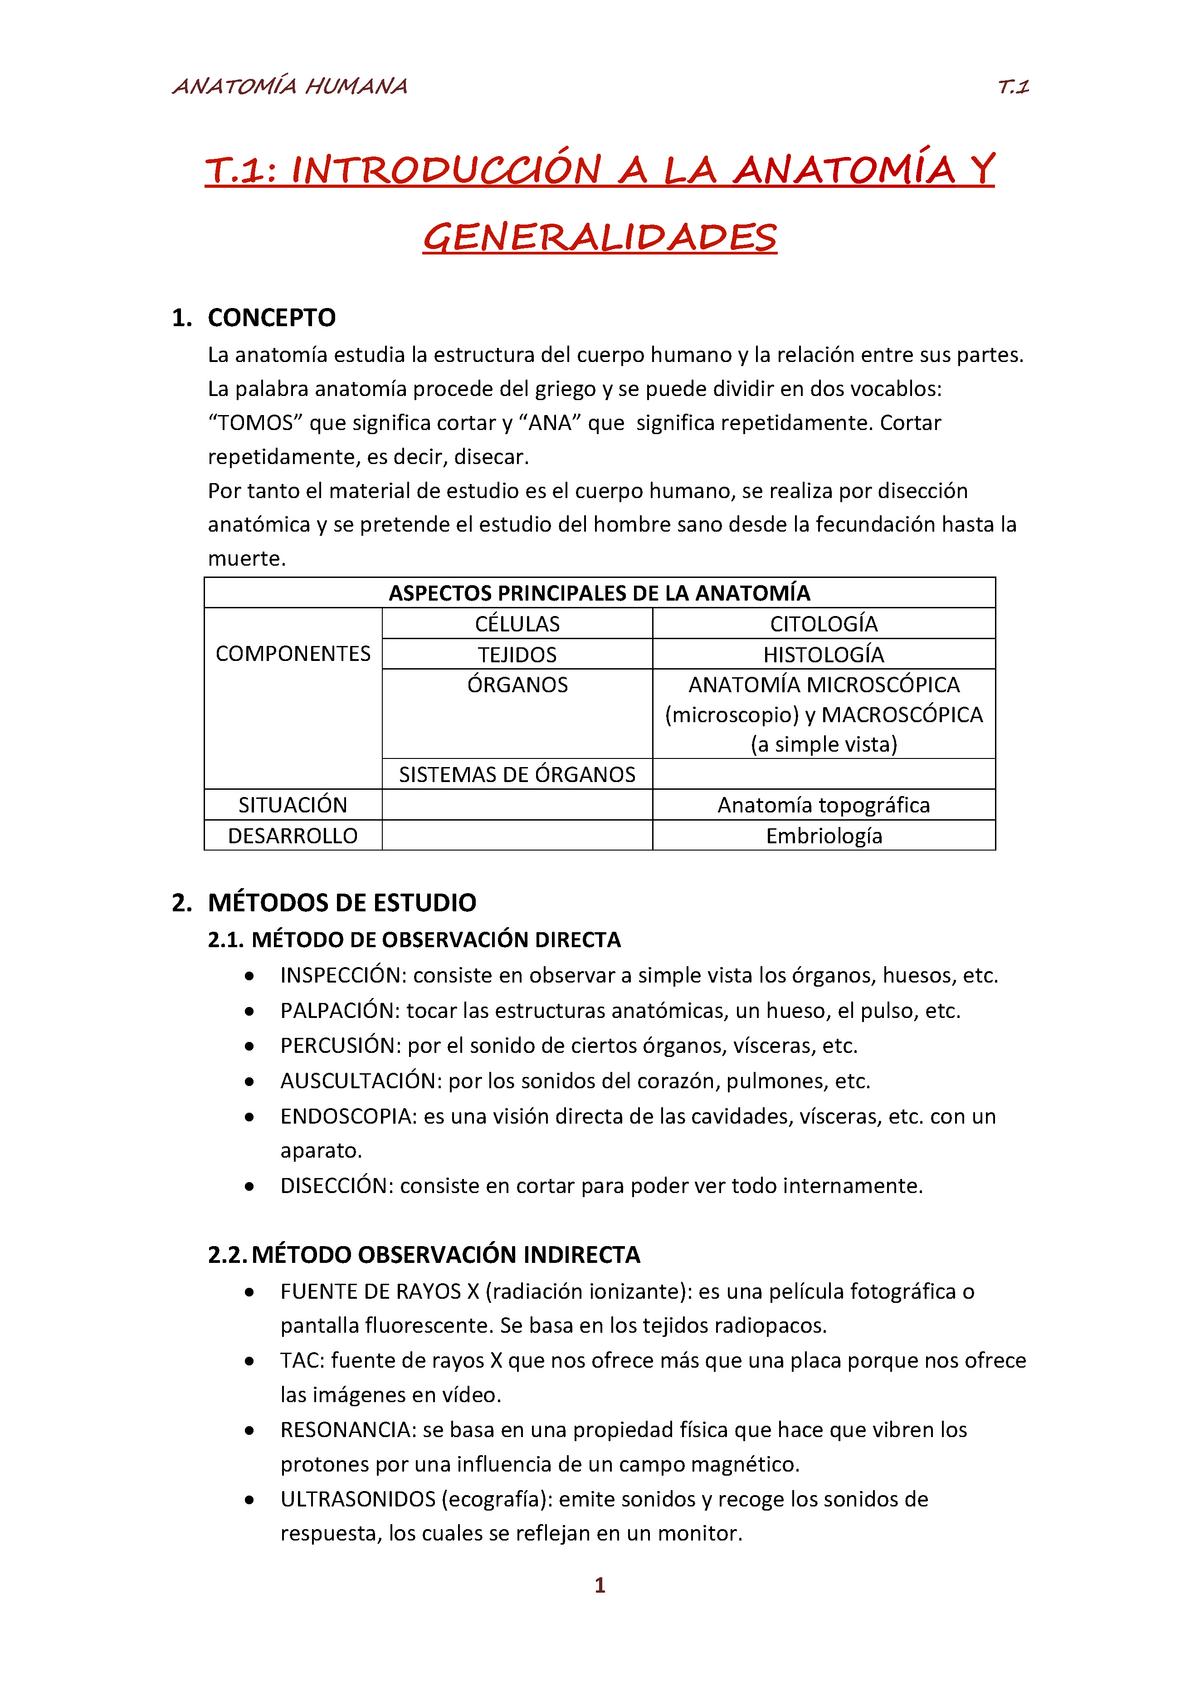 Resúmen completo Temas 1-14 pdf - Anatomía Humana G2031101